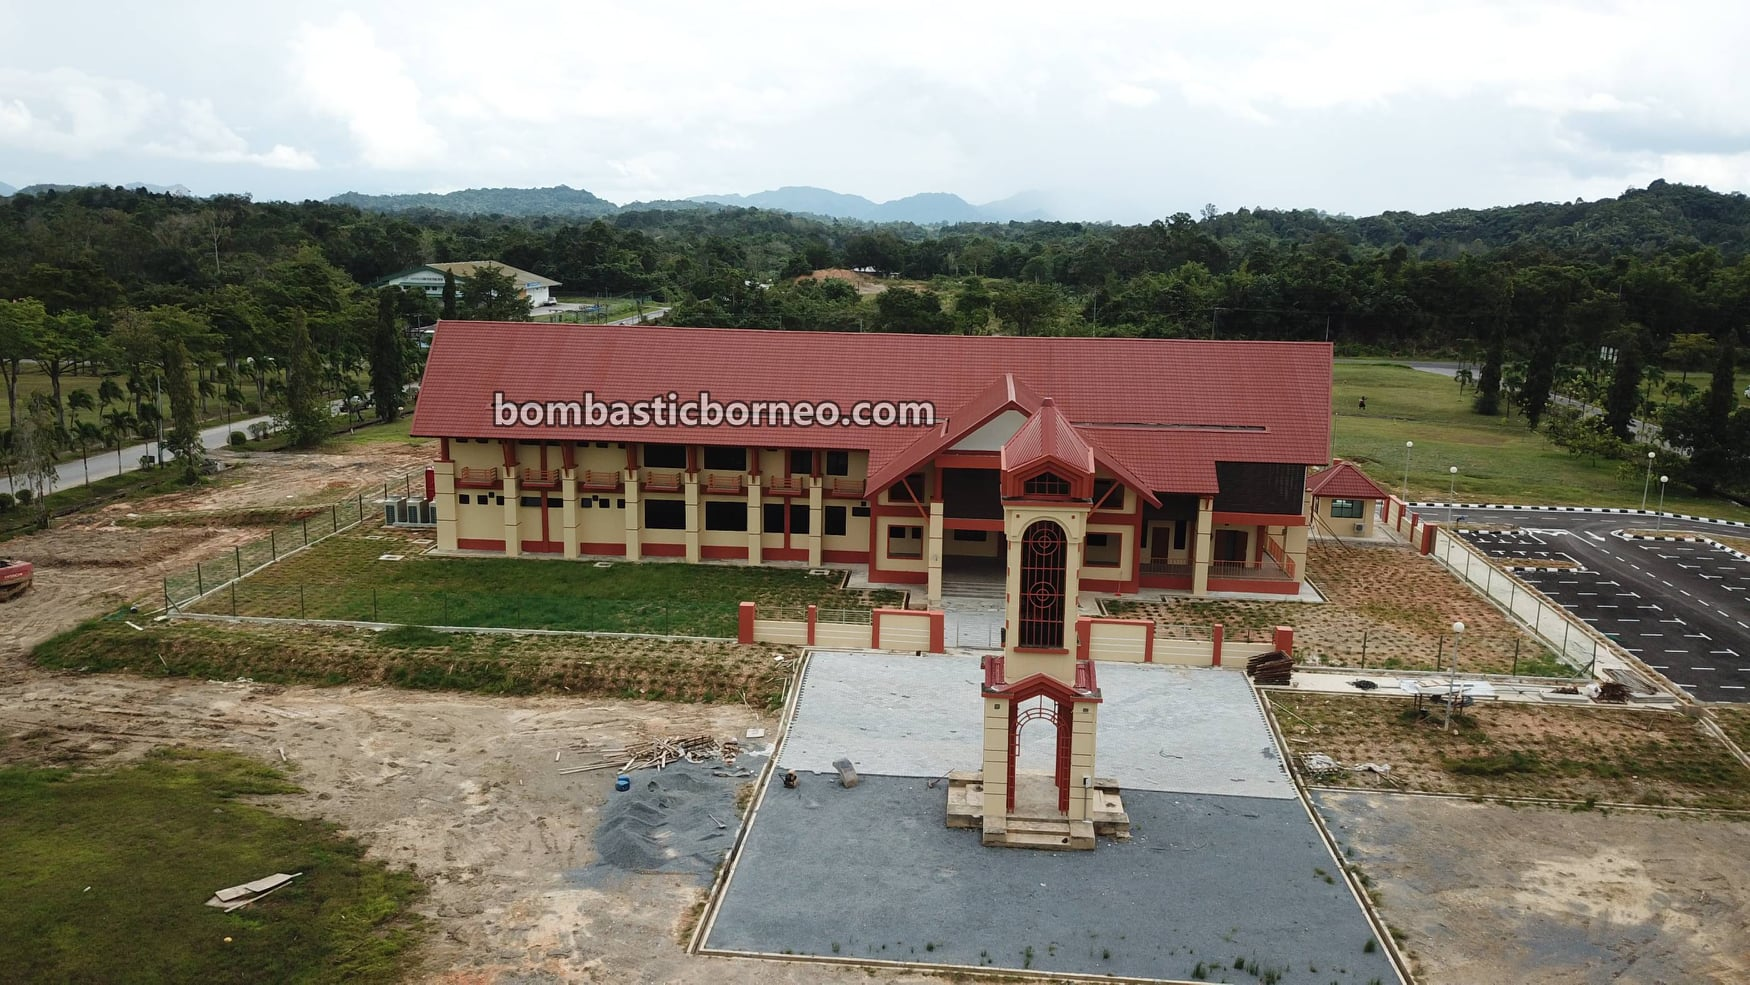 Pejabat Daerah Tebedu, KLB Garden, Agro Park, exploration, Tourism, tourist attraction, travel guide, Borneo, 马来西亚砂拉越, 西连打必律